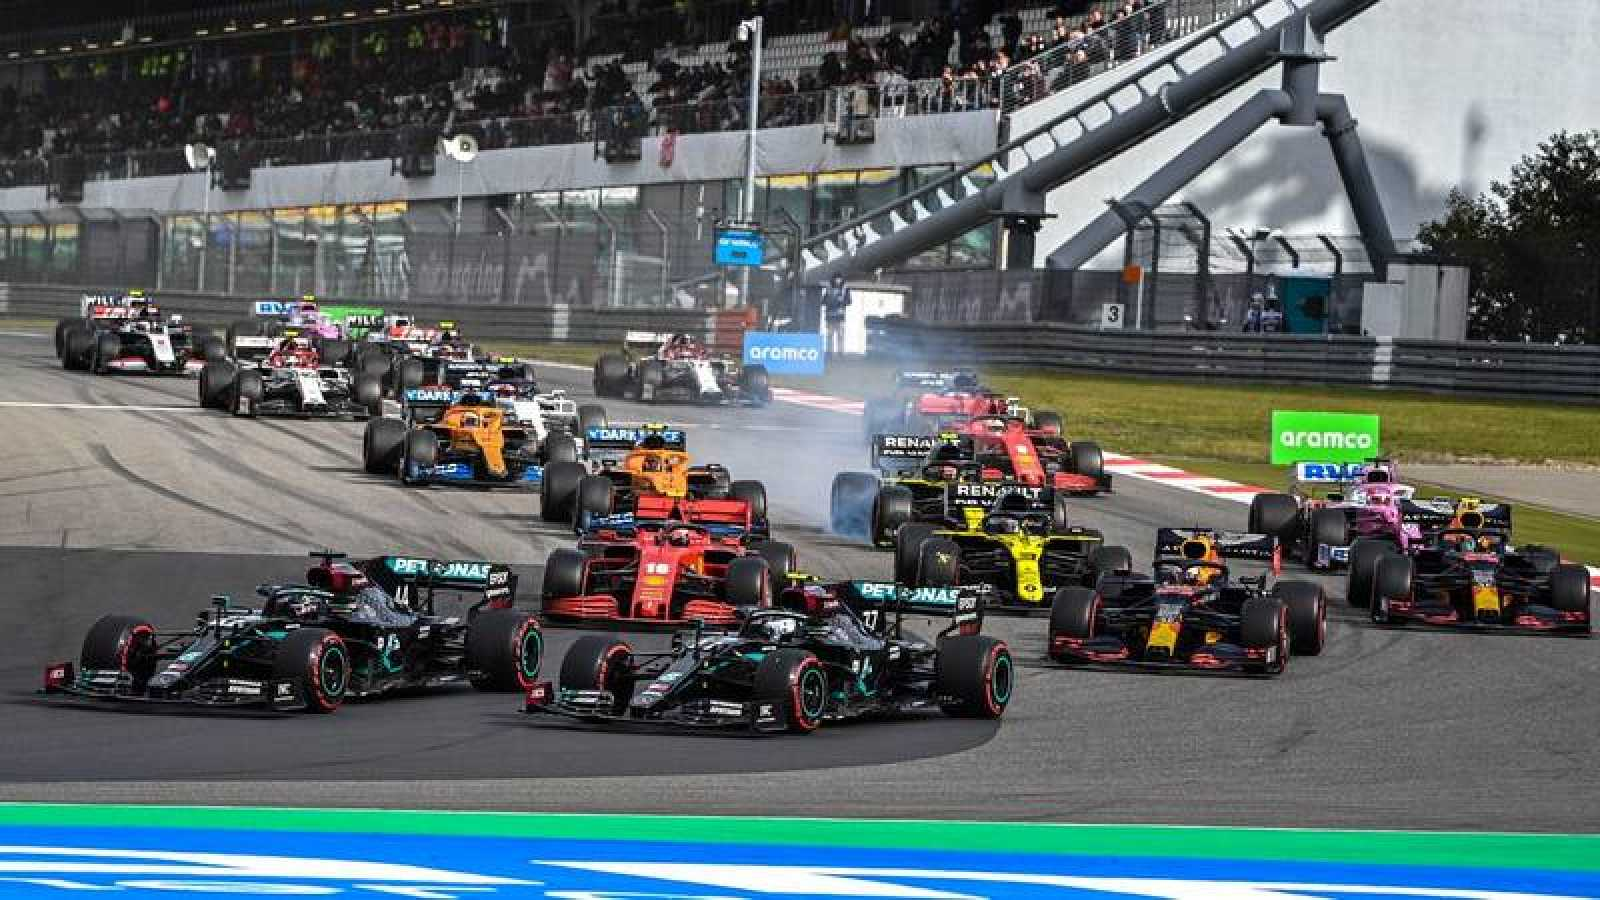 Imagen del pasado GP de Eifel de Fórmula 1